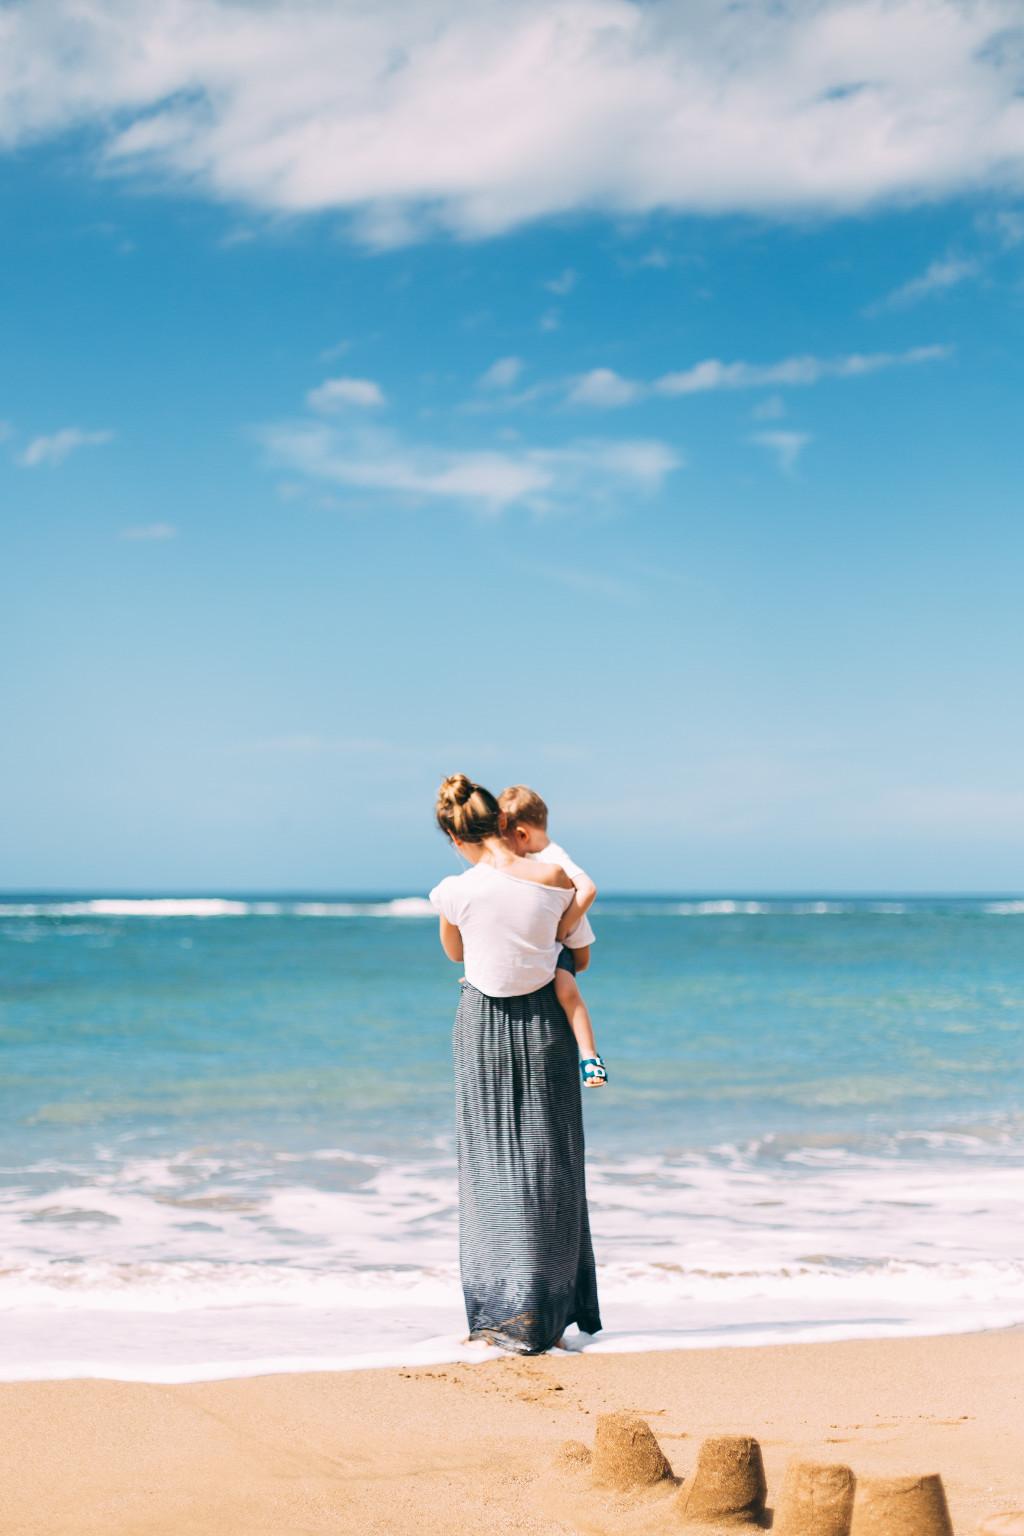 Mutter hält Kind auf dem Arm am Strand